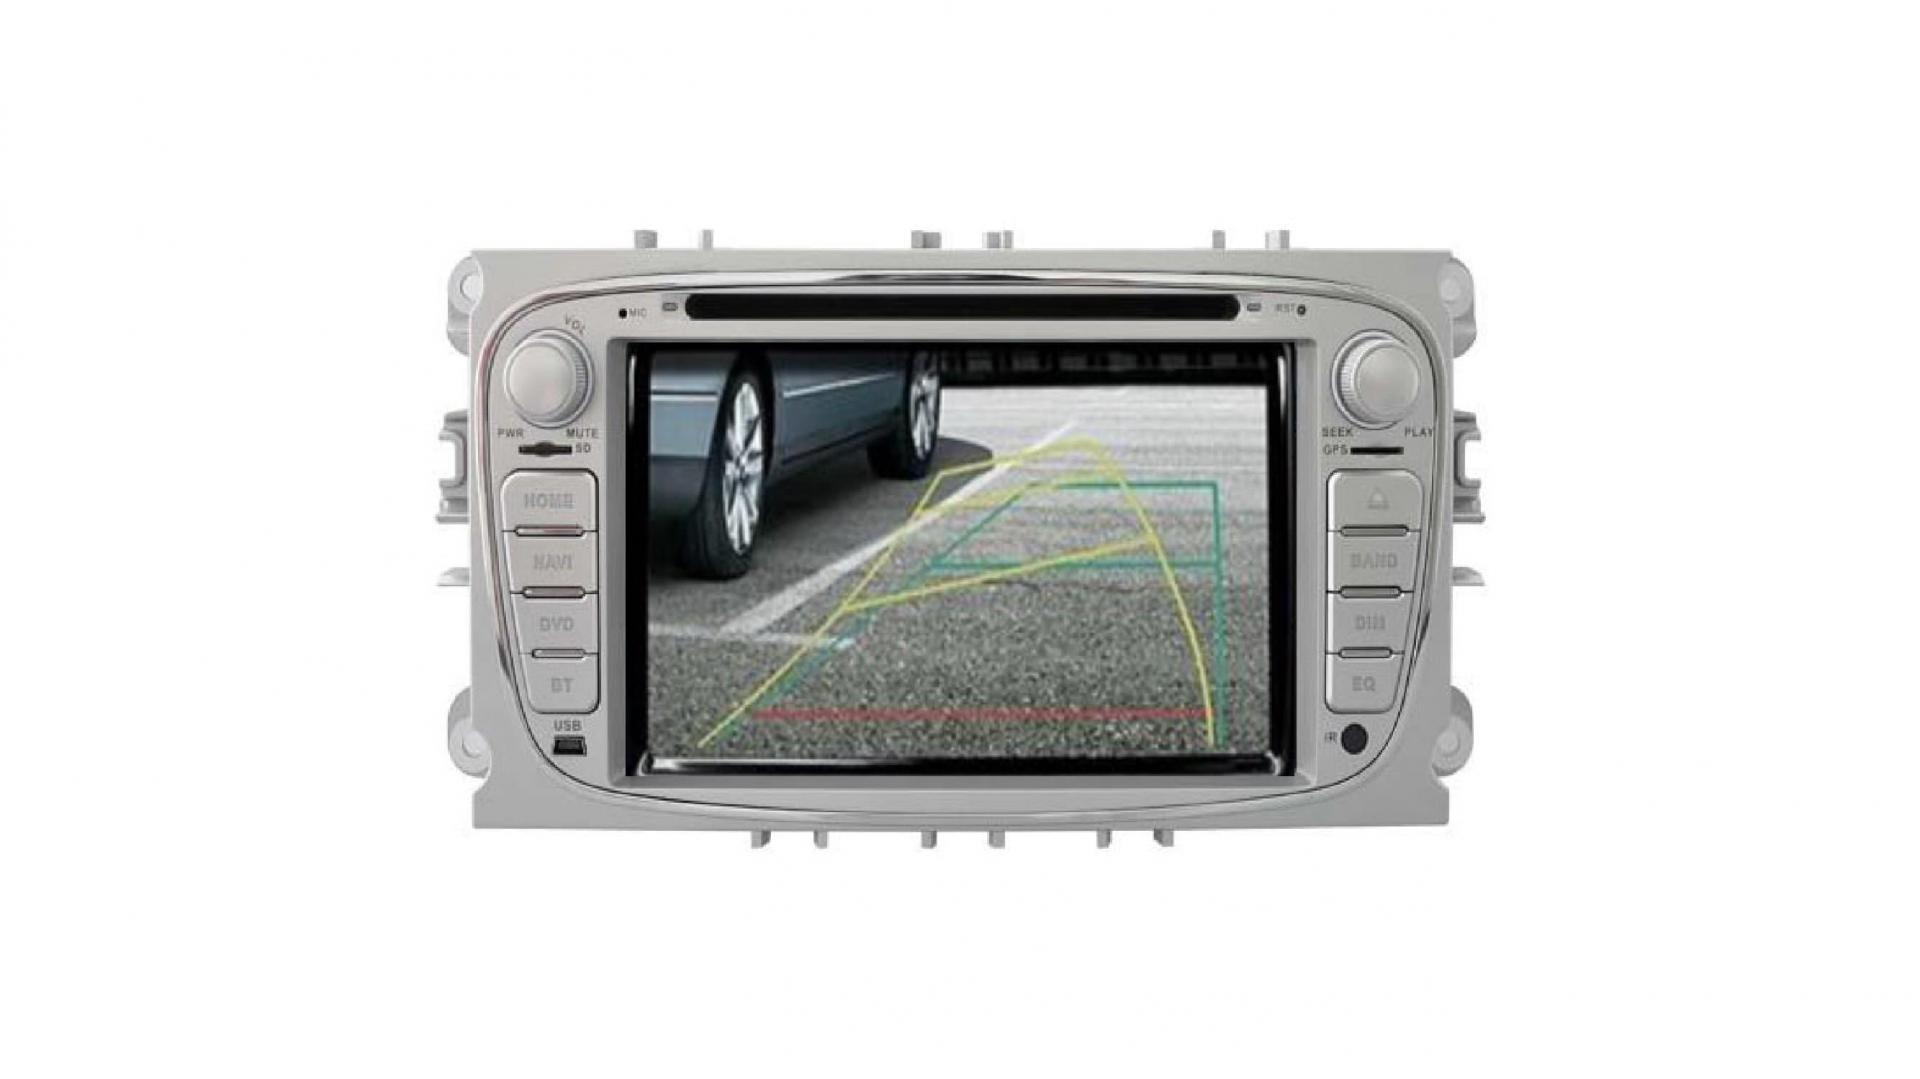 Autoradio s max galaxy mondeo focus autoradio gps bluetooth android auto carplay camera de recul commande au volant1